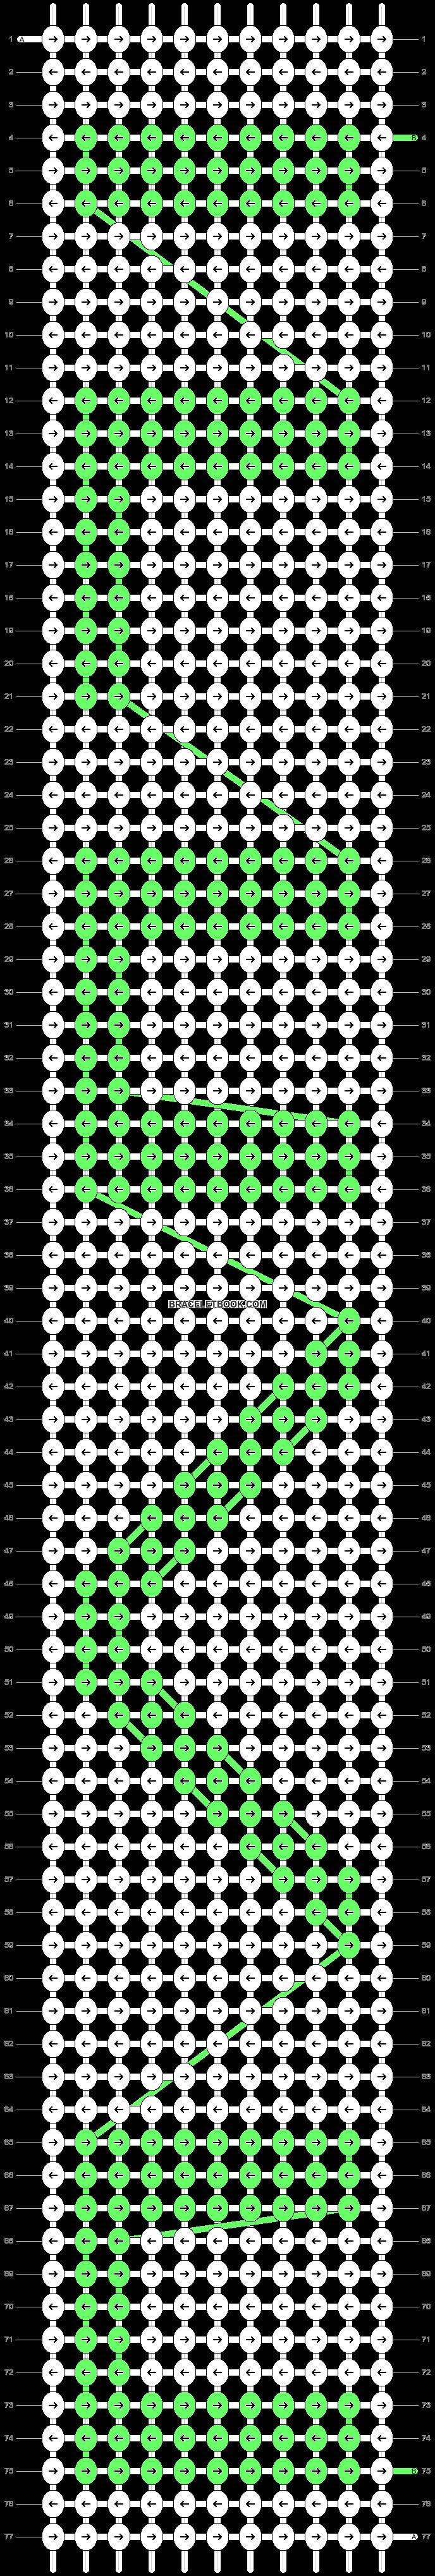 Alpha pattern #858 pattern